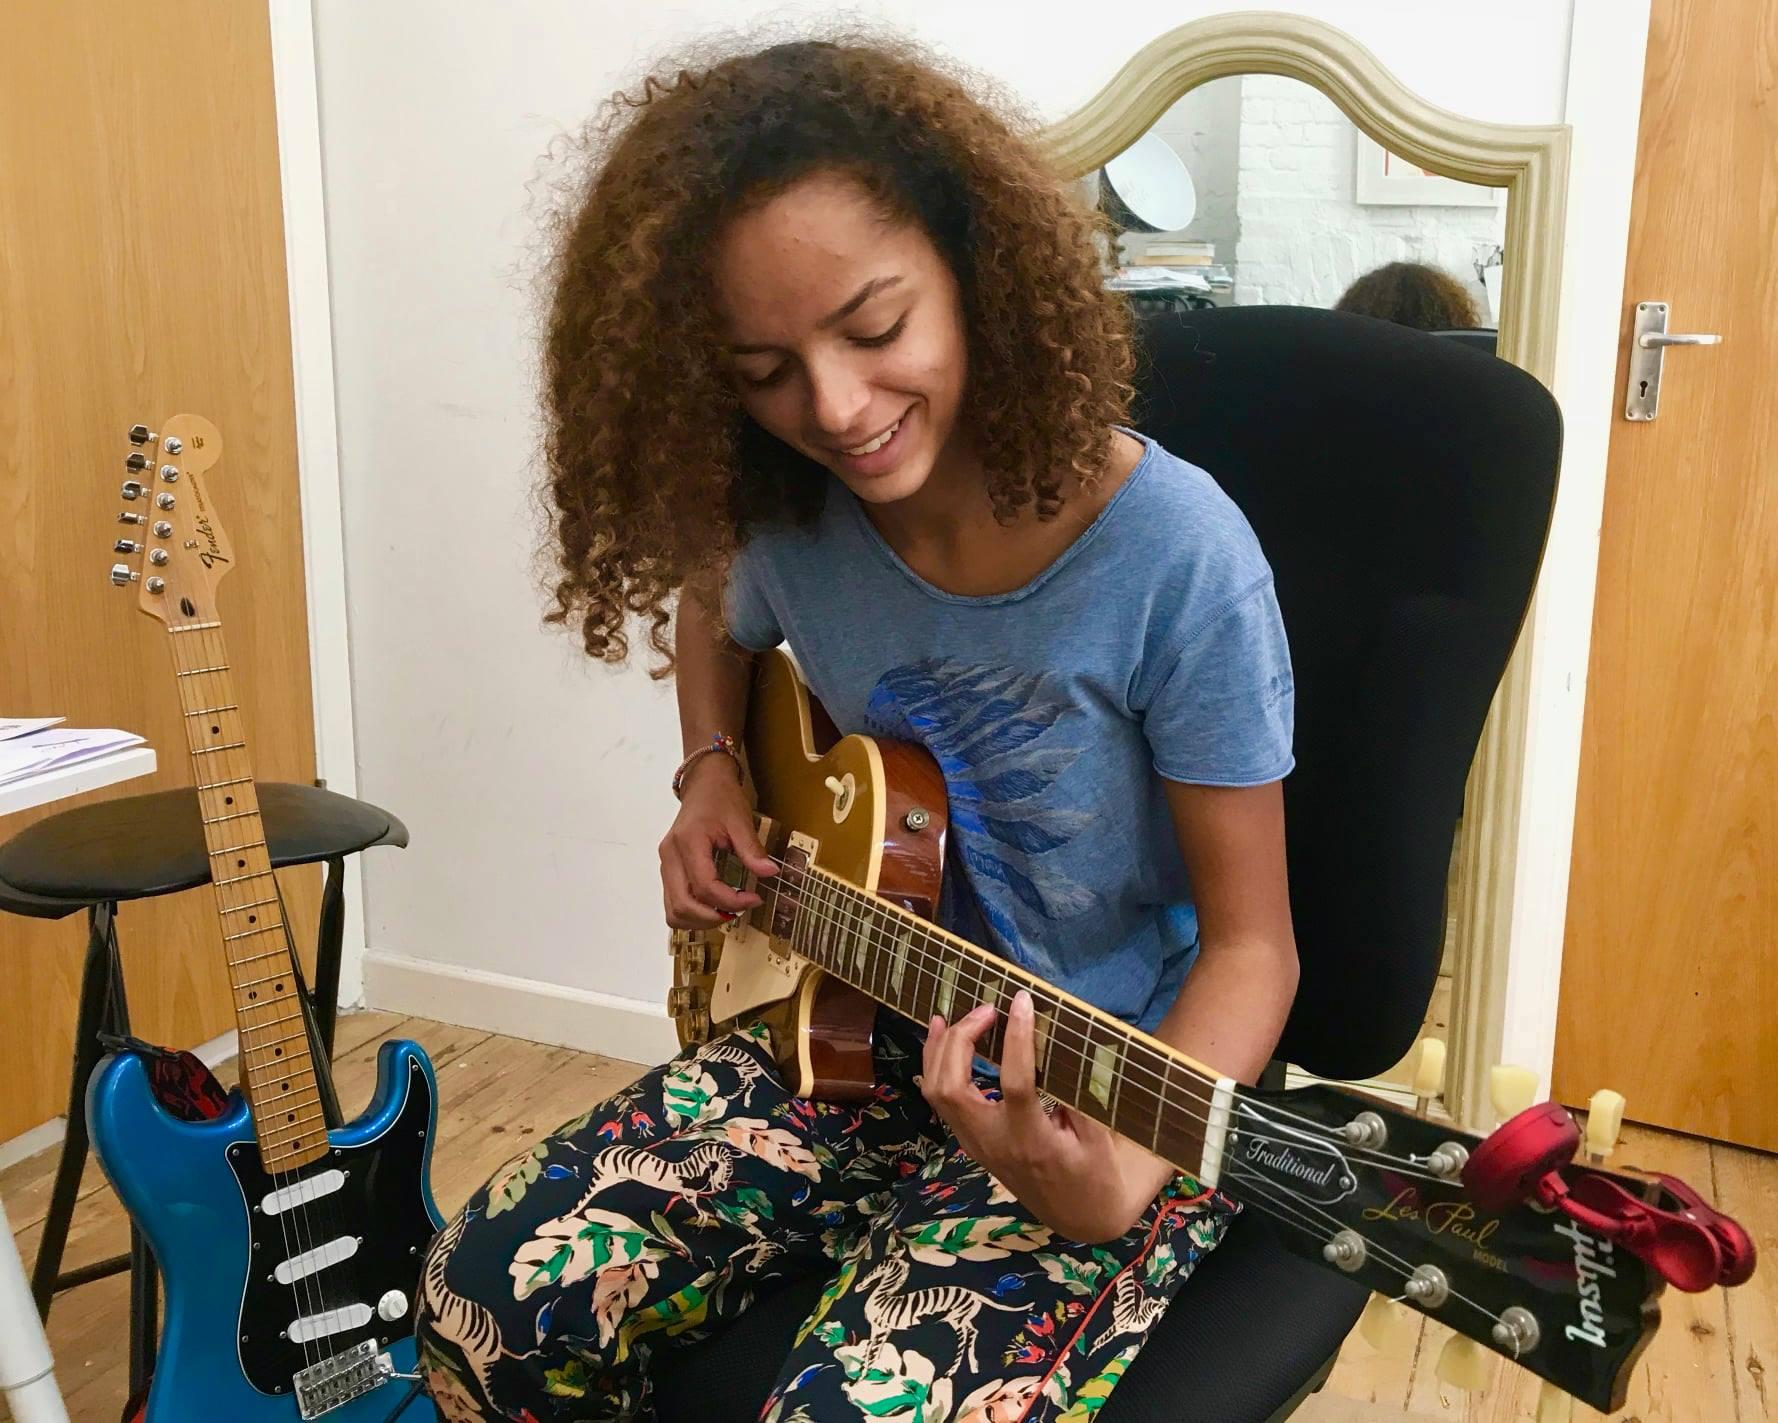 West Hampstead Guitar Academy